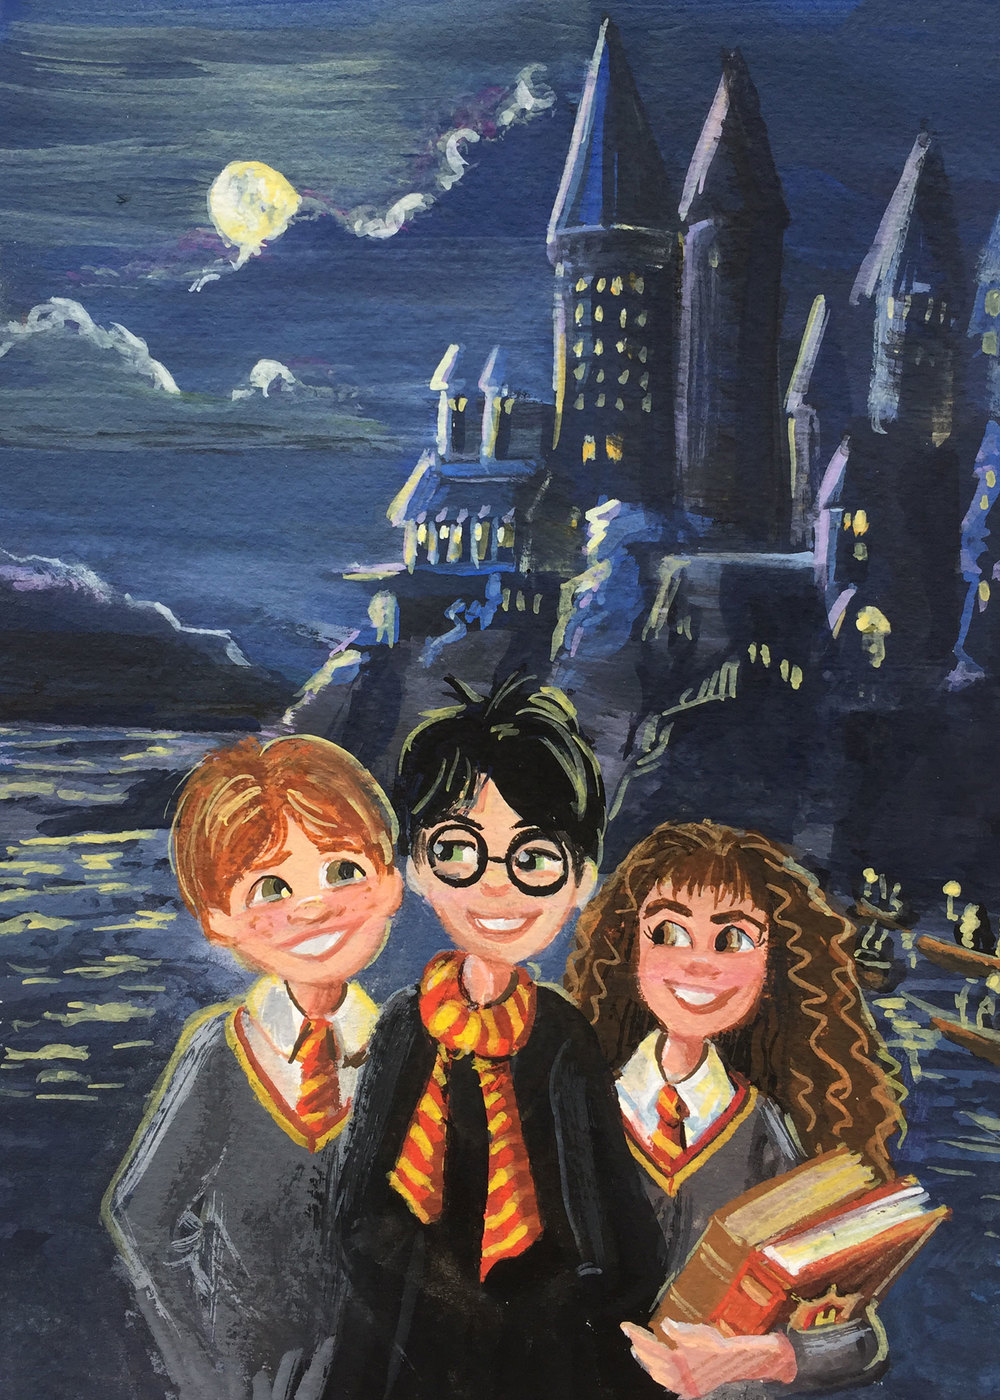 HarryPotter5x7.jpg